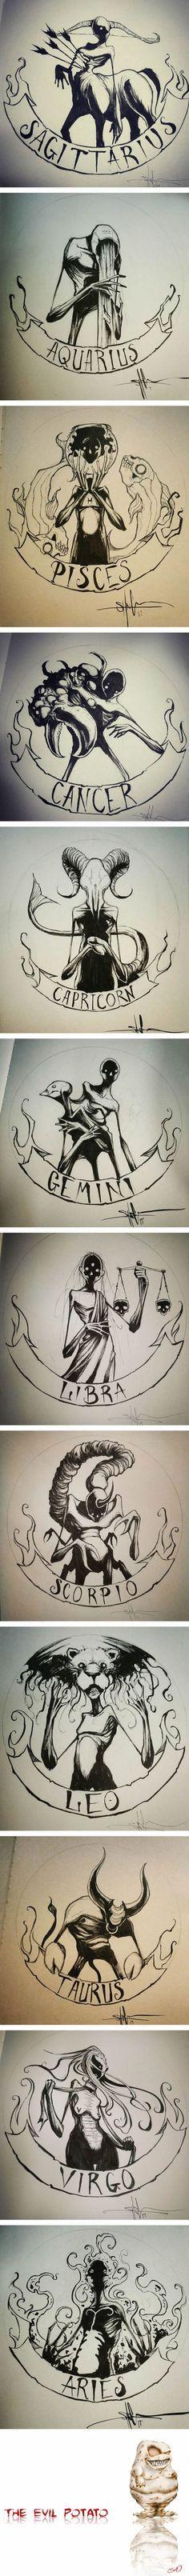 Zodiac signs as creepy monsters cancer zodiac art, sagittarius art, capricorn tattoo, taurus Zodiac Art, Zodiac Signs, Leo Zodiac, Scorpio, 2017 Zodiac, Zodiac Horoscope, Horoscopes, Art Zodiaque, Creepy Monster